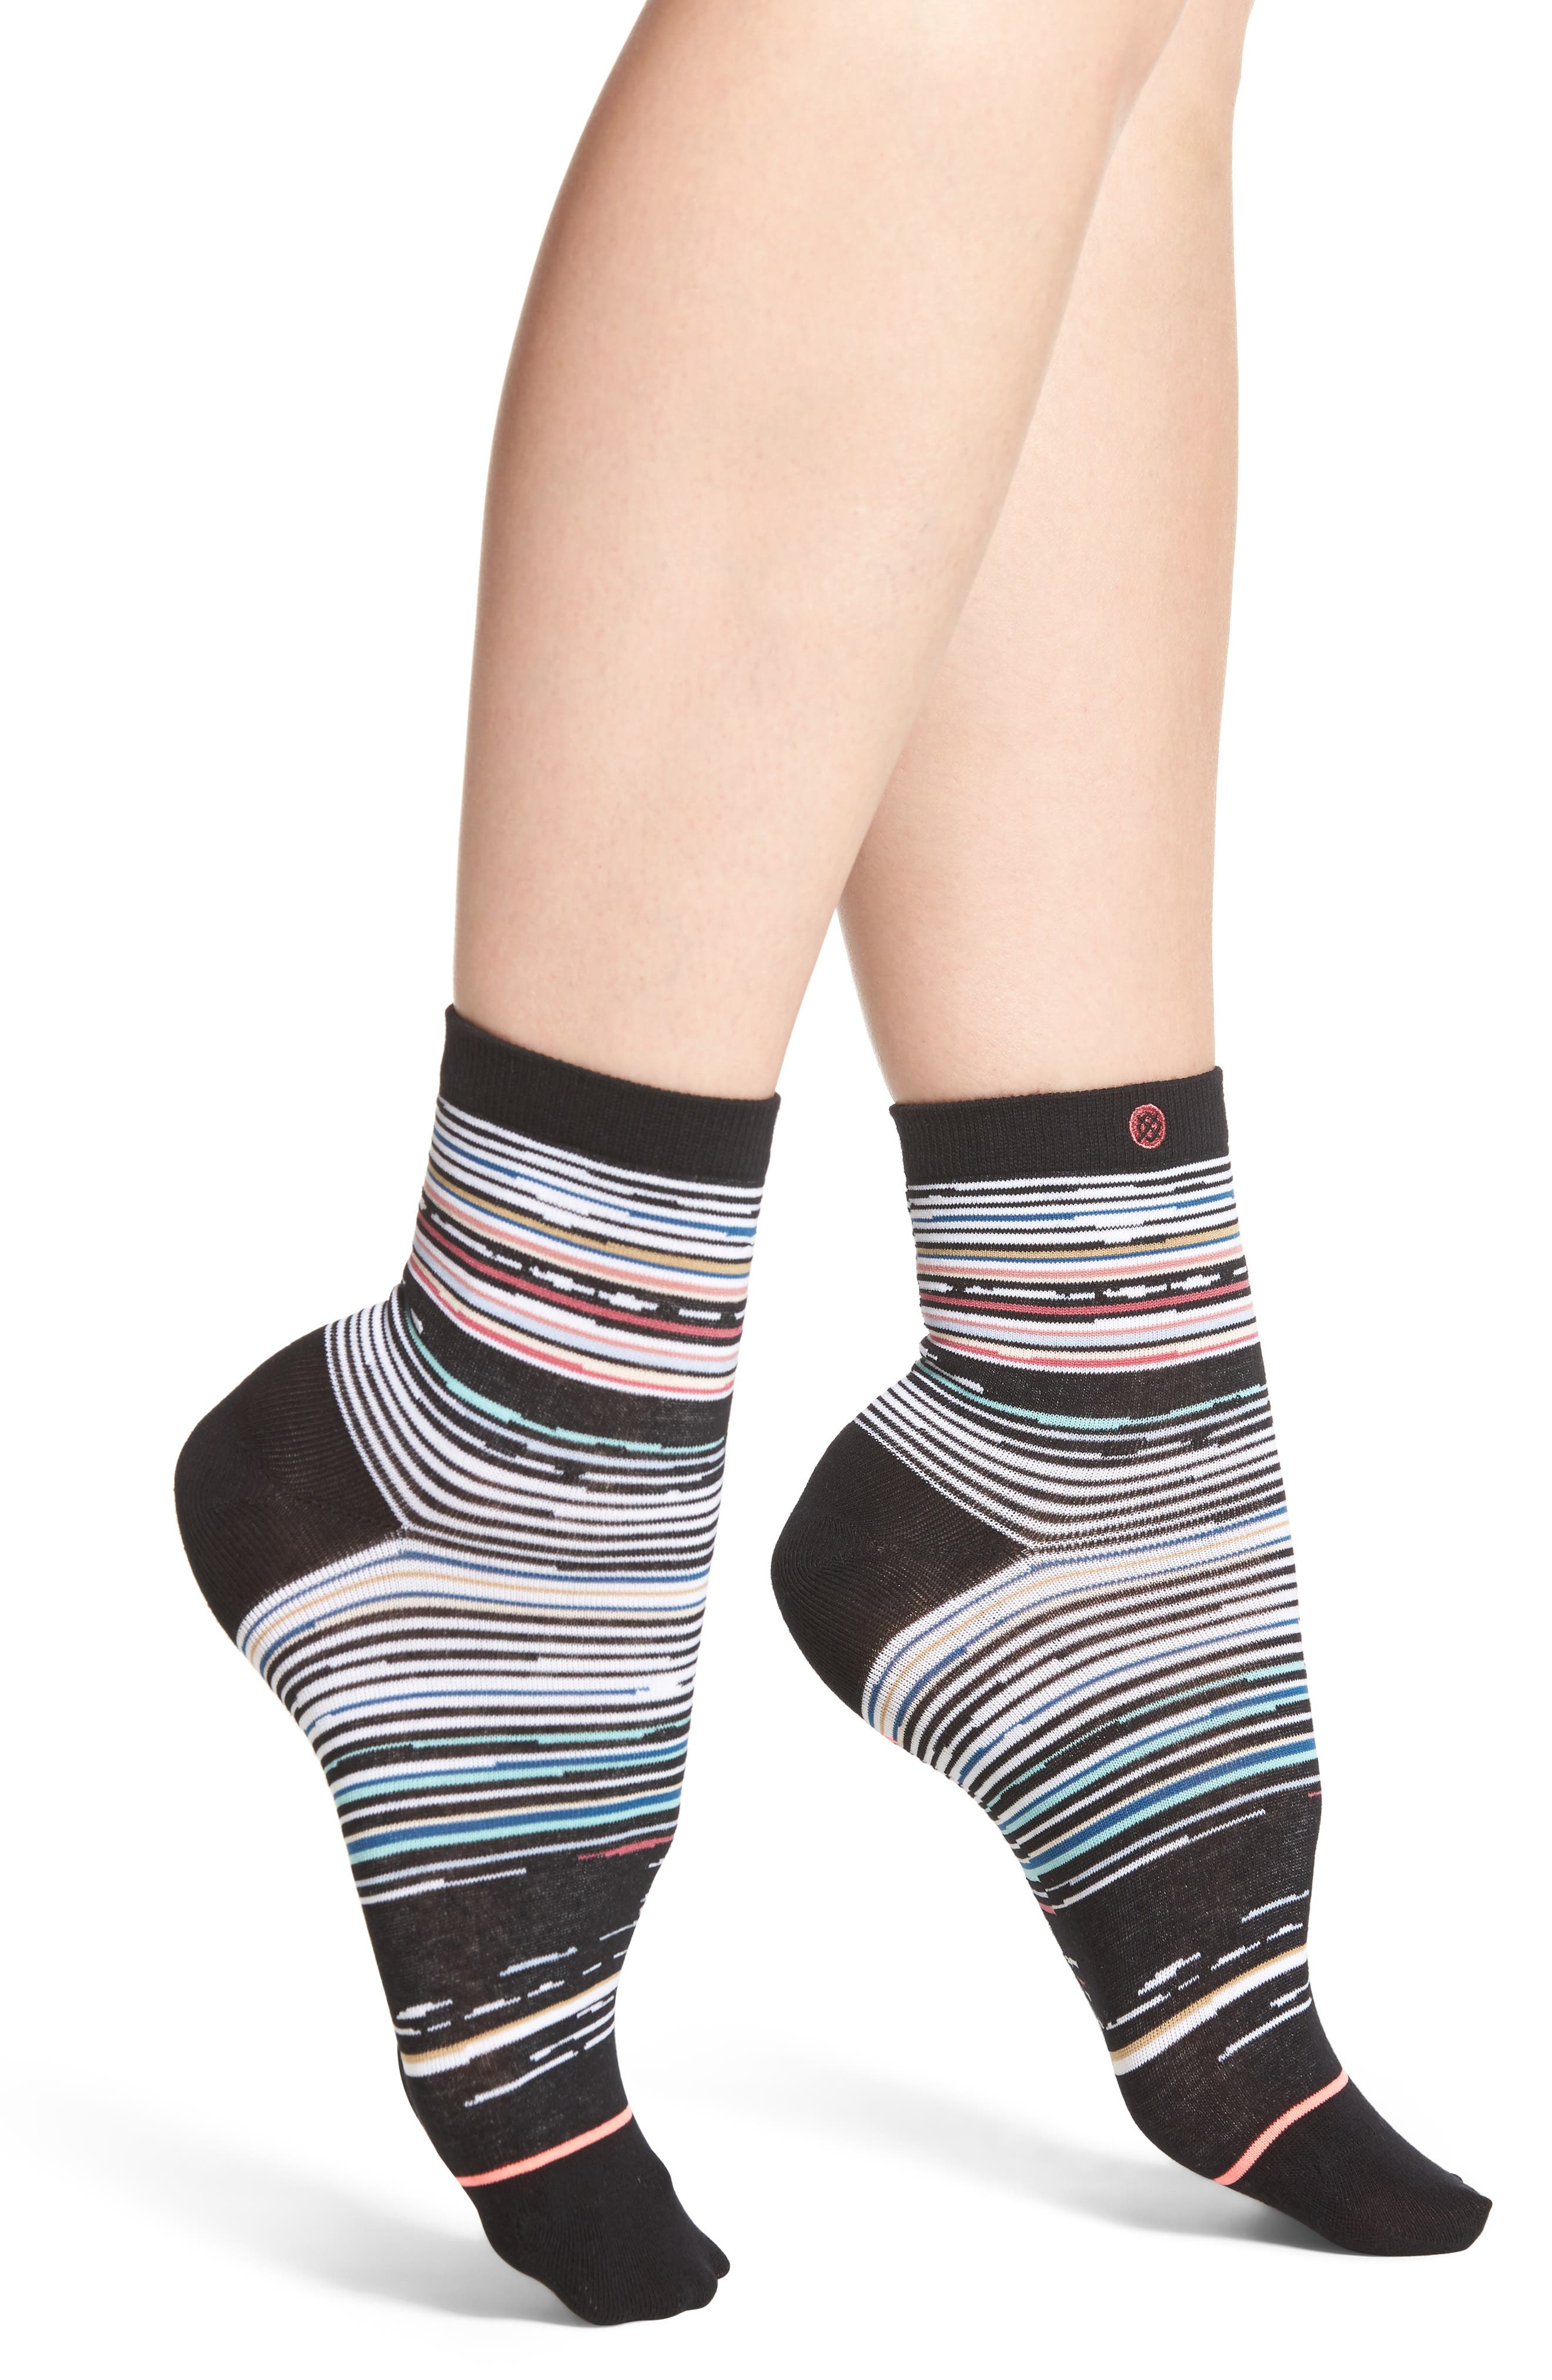 Stance Lowrider Hyper Socks